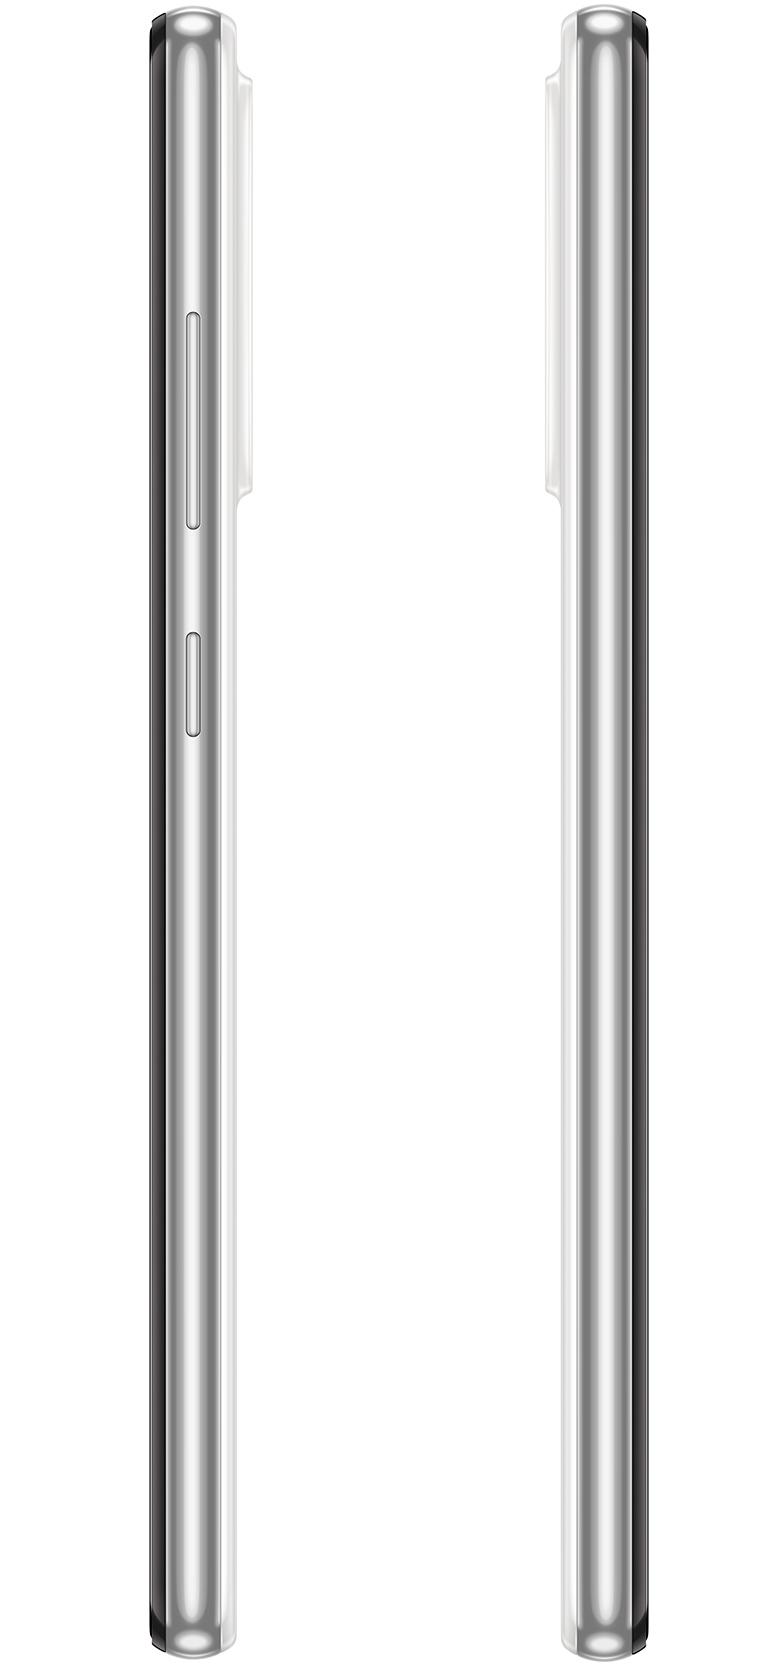 Samsung Galaxy A52 DS (SM-A525) 256GB White - 5